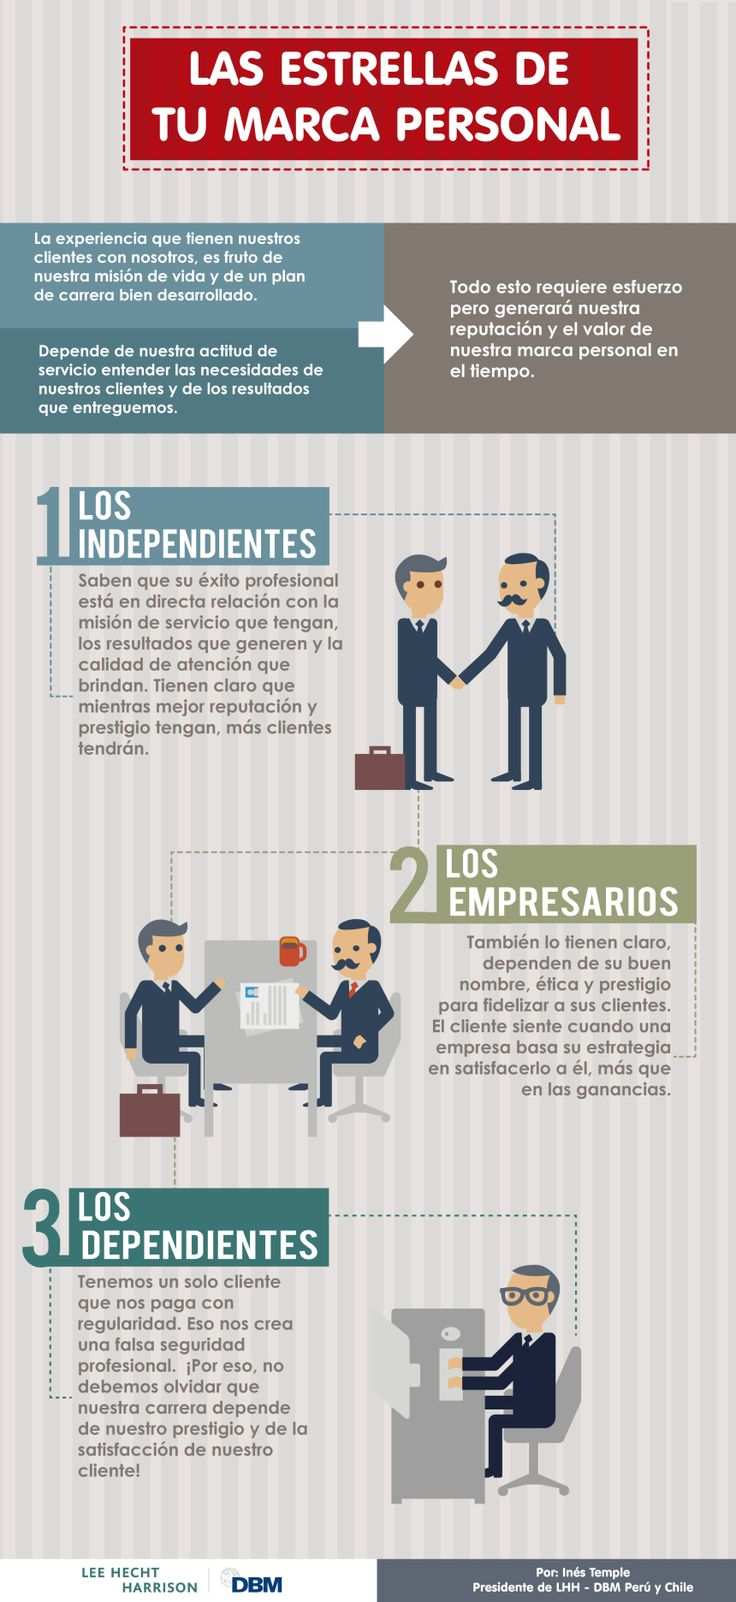 Las estrellas de tu Marca Personal #infografia #infographic #marketing